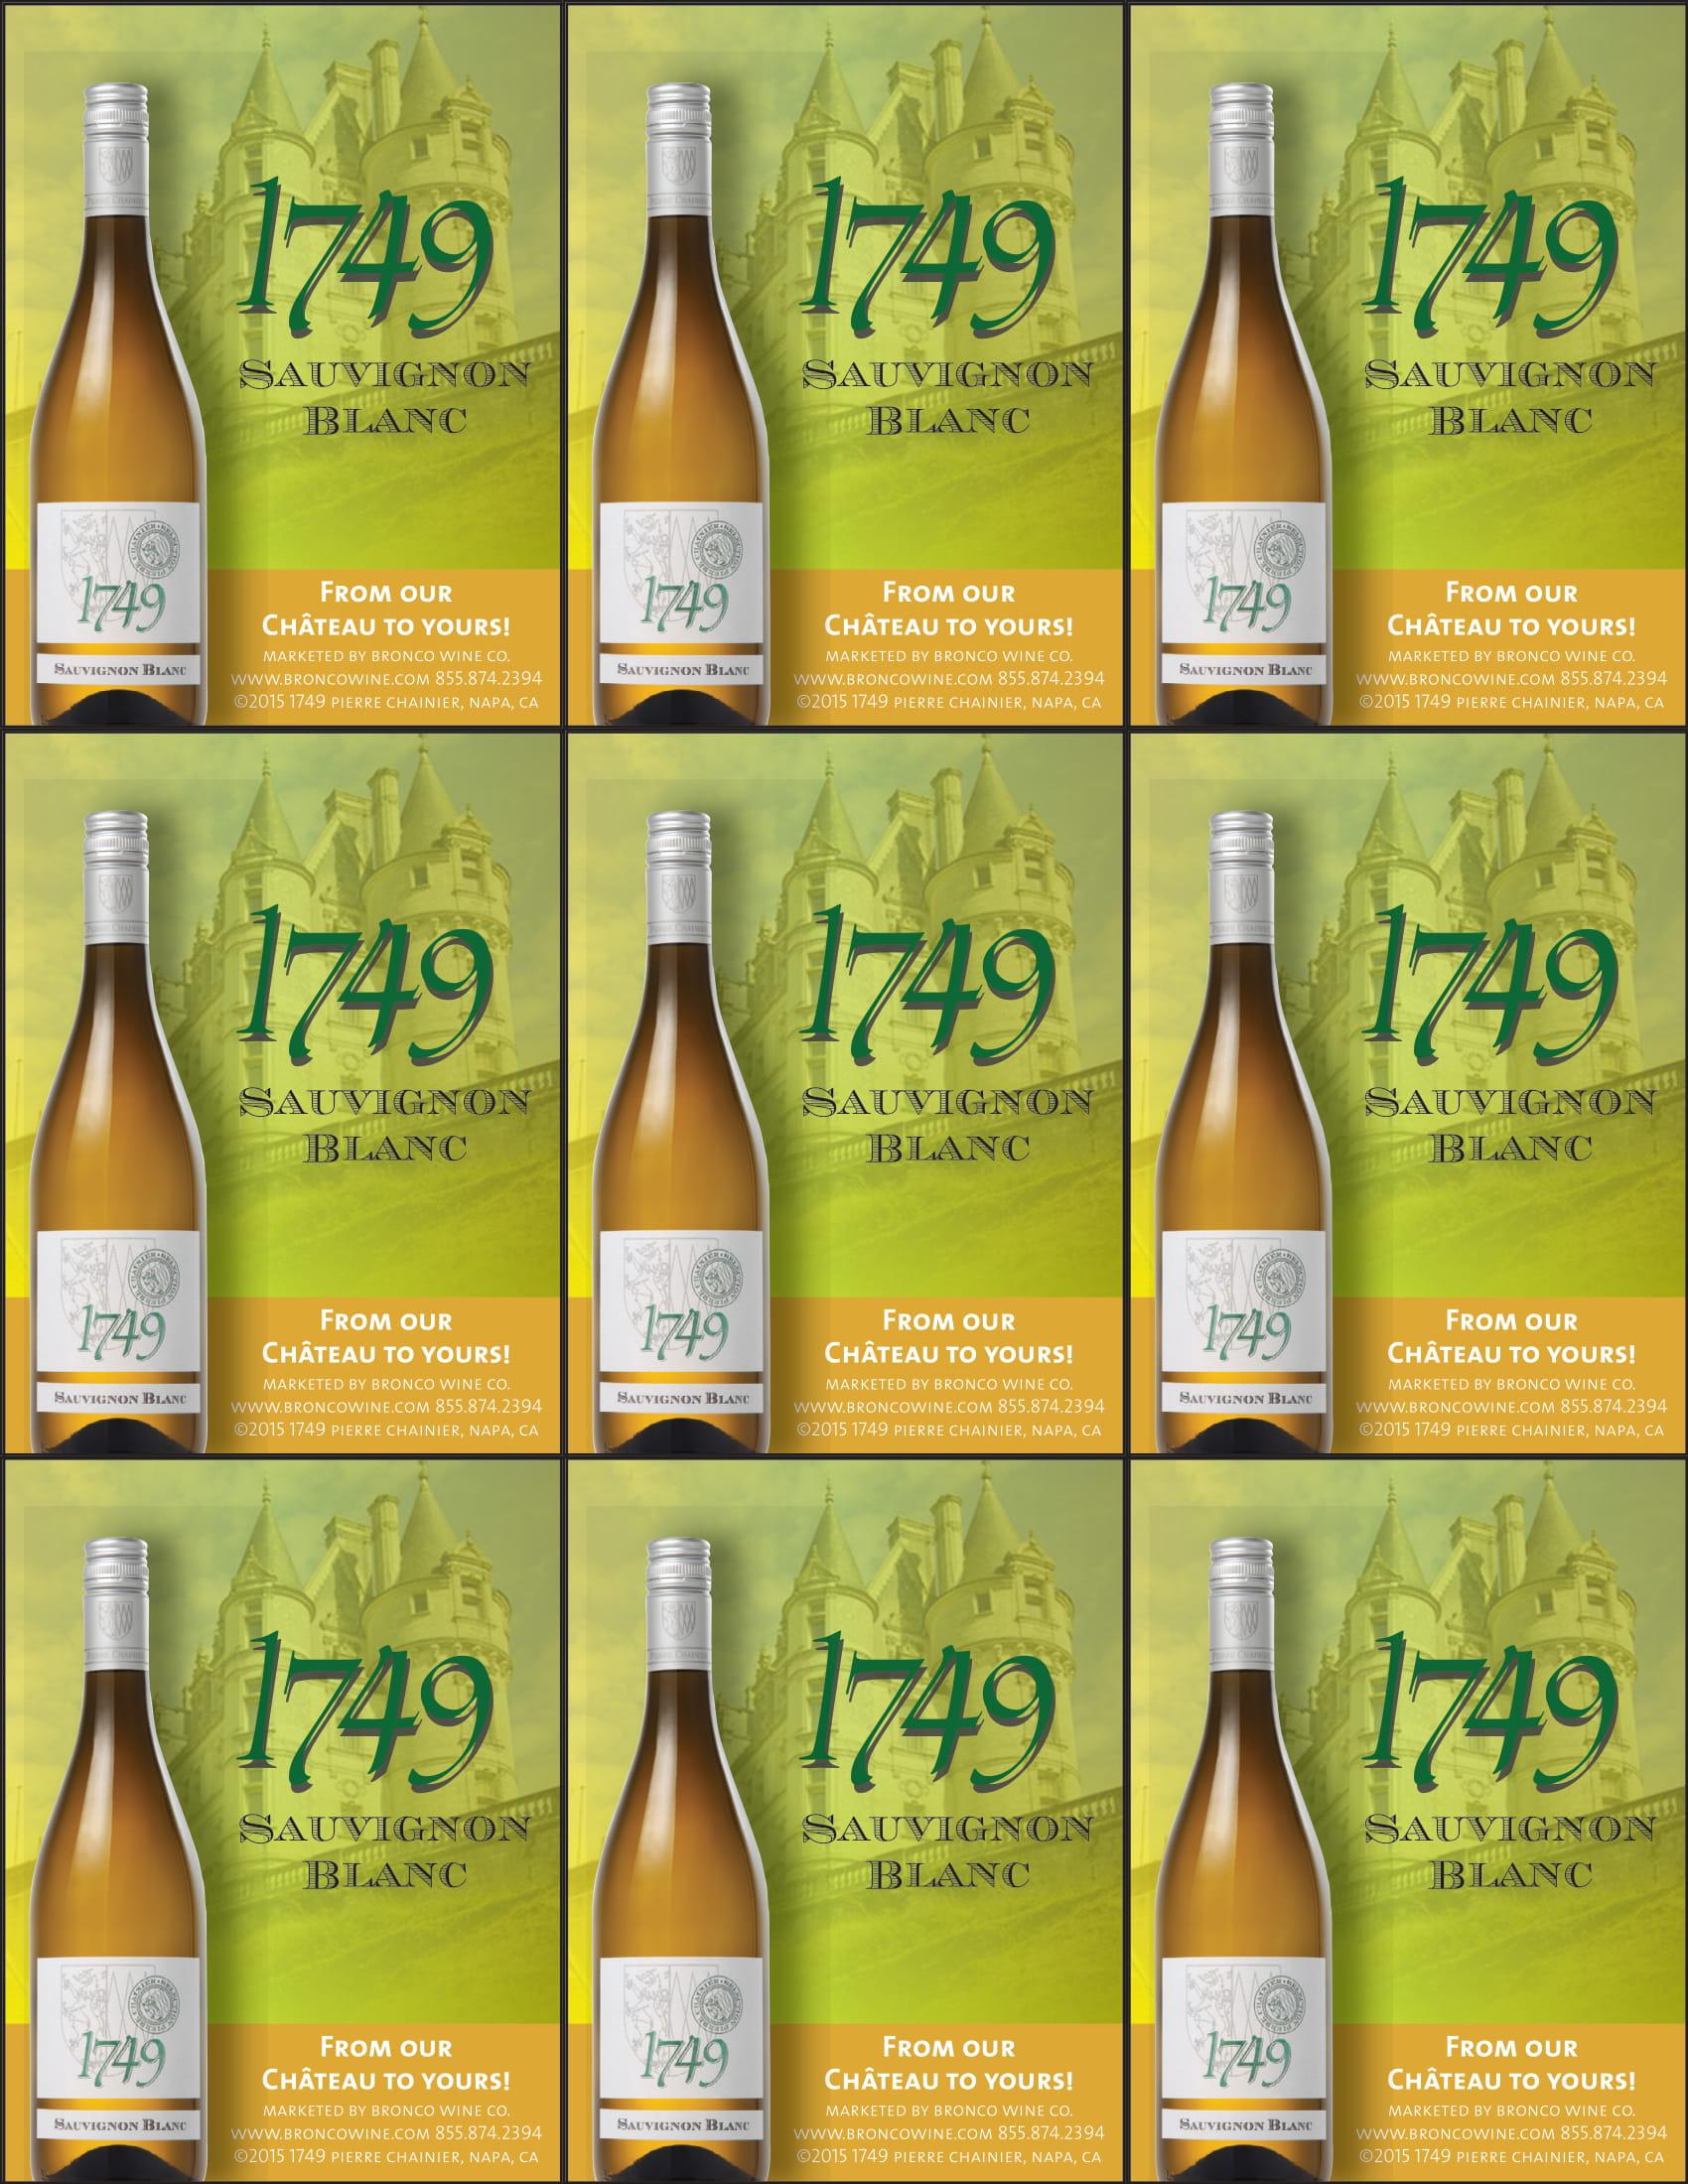 1749 Sauvignon Blanc Shelf Talkers